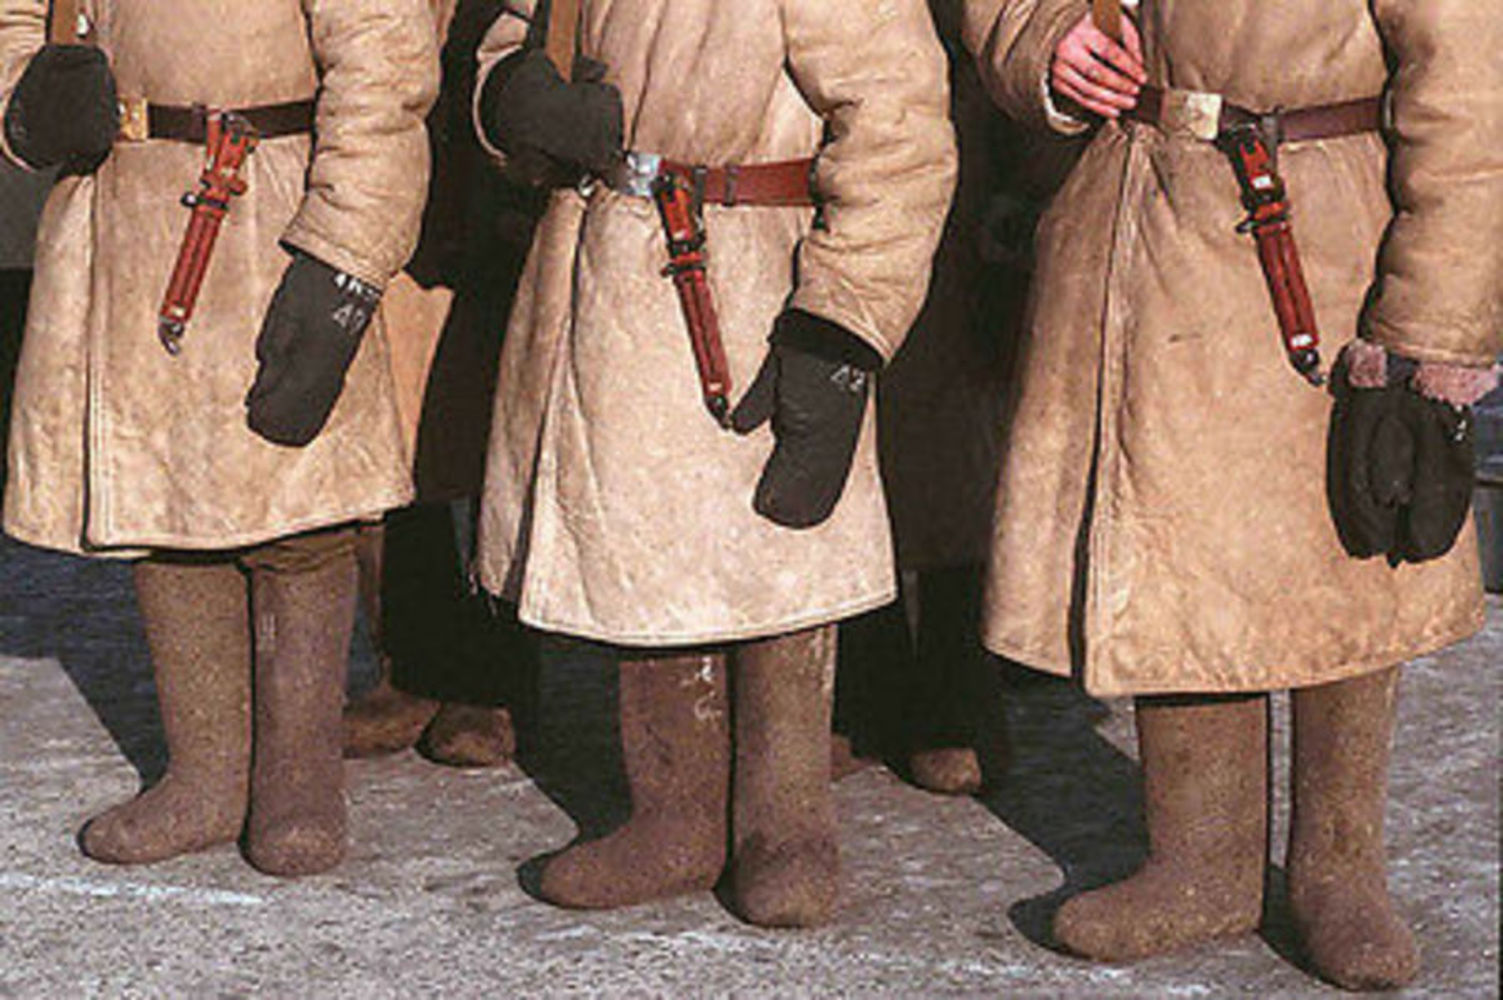 Soviet russian army standard winter felt boots valenki.thumb